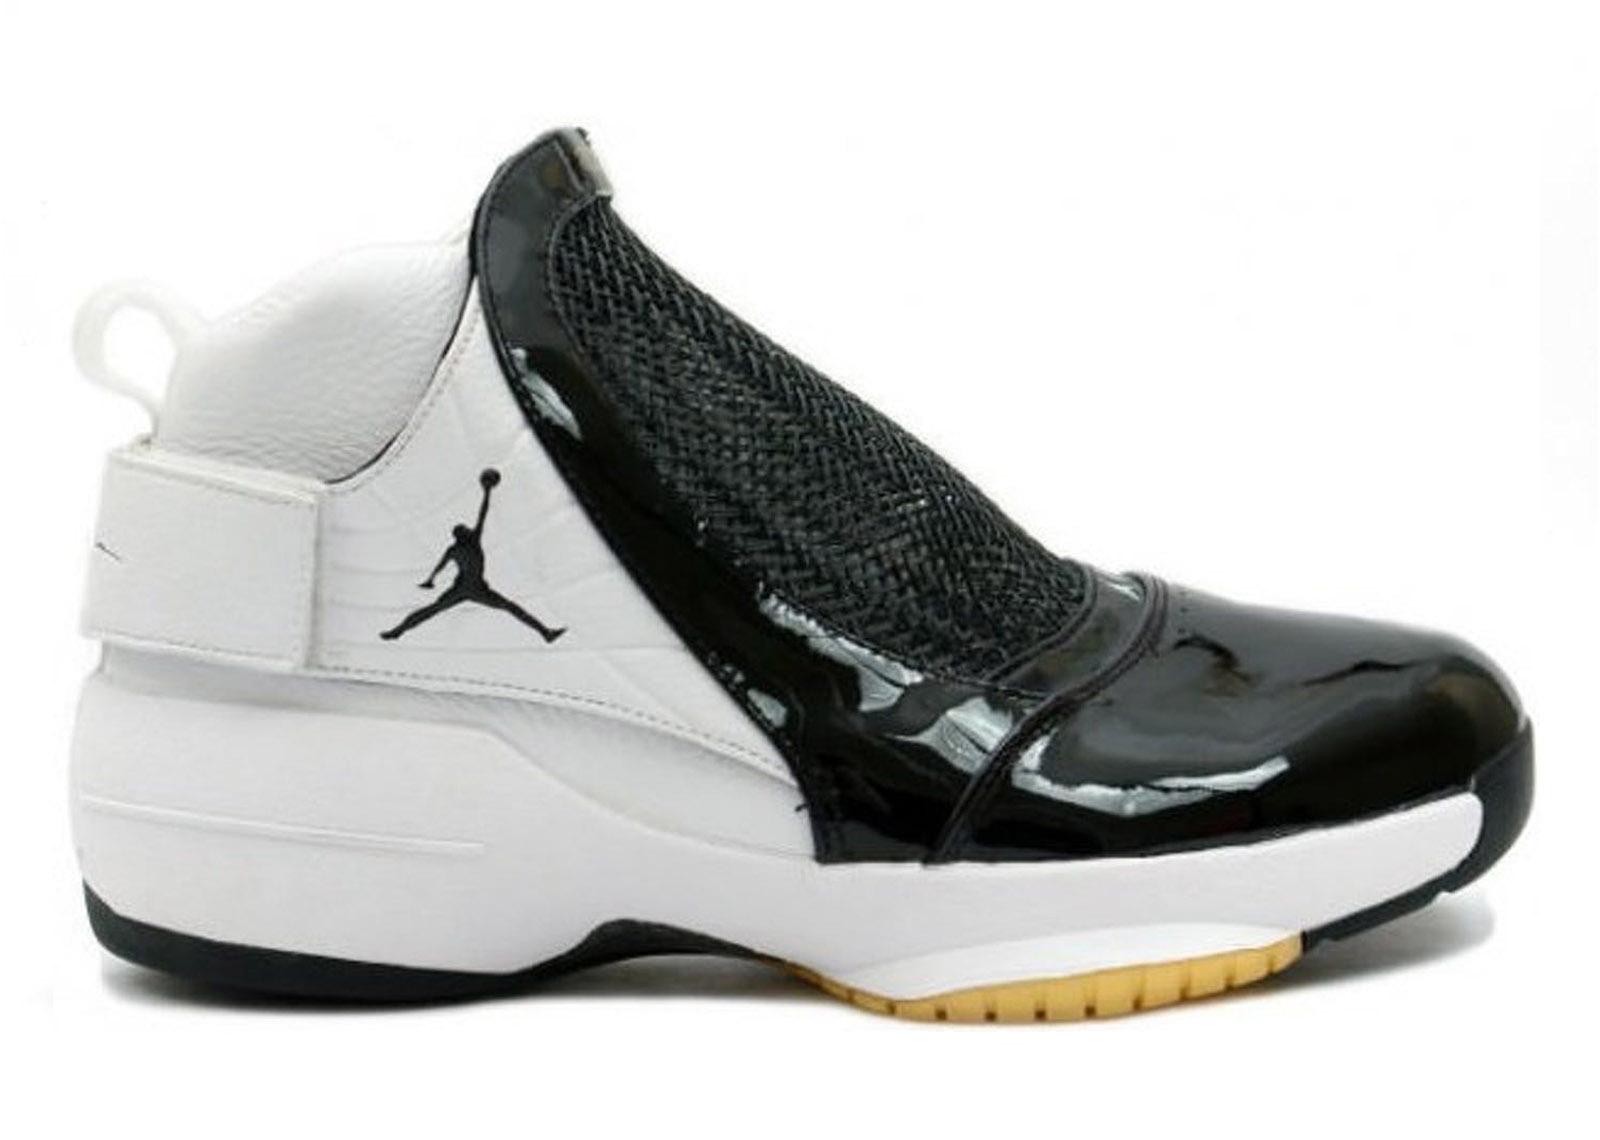 An Air Jordan 19 Retro is Scheduled for